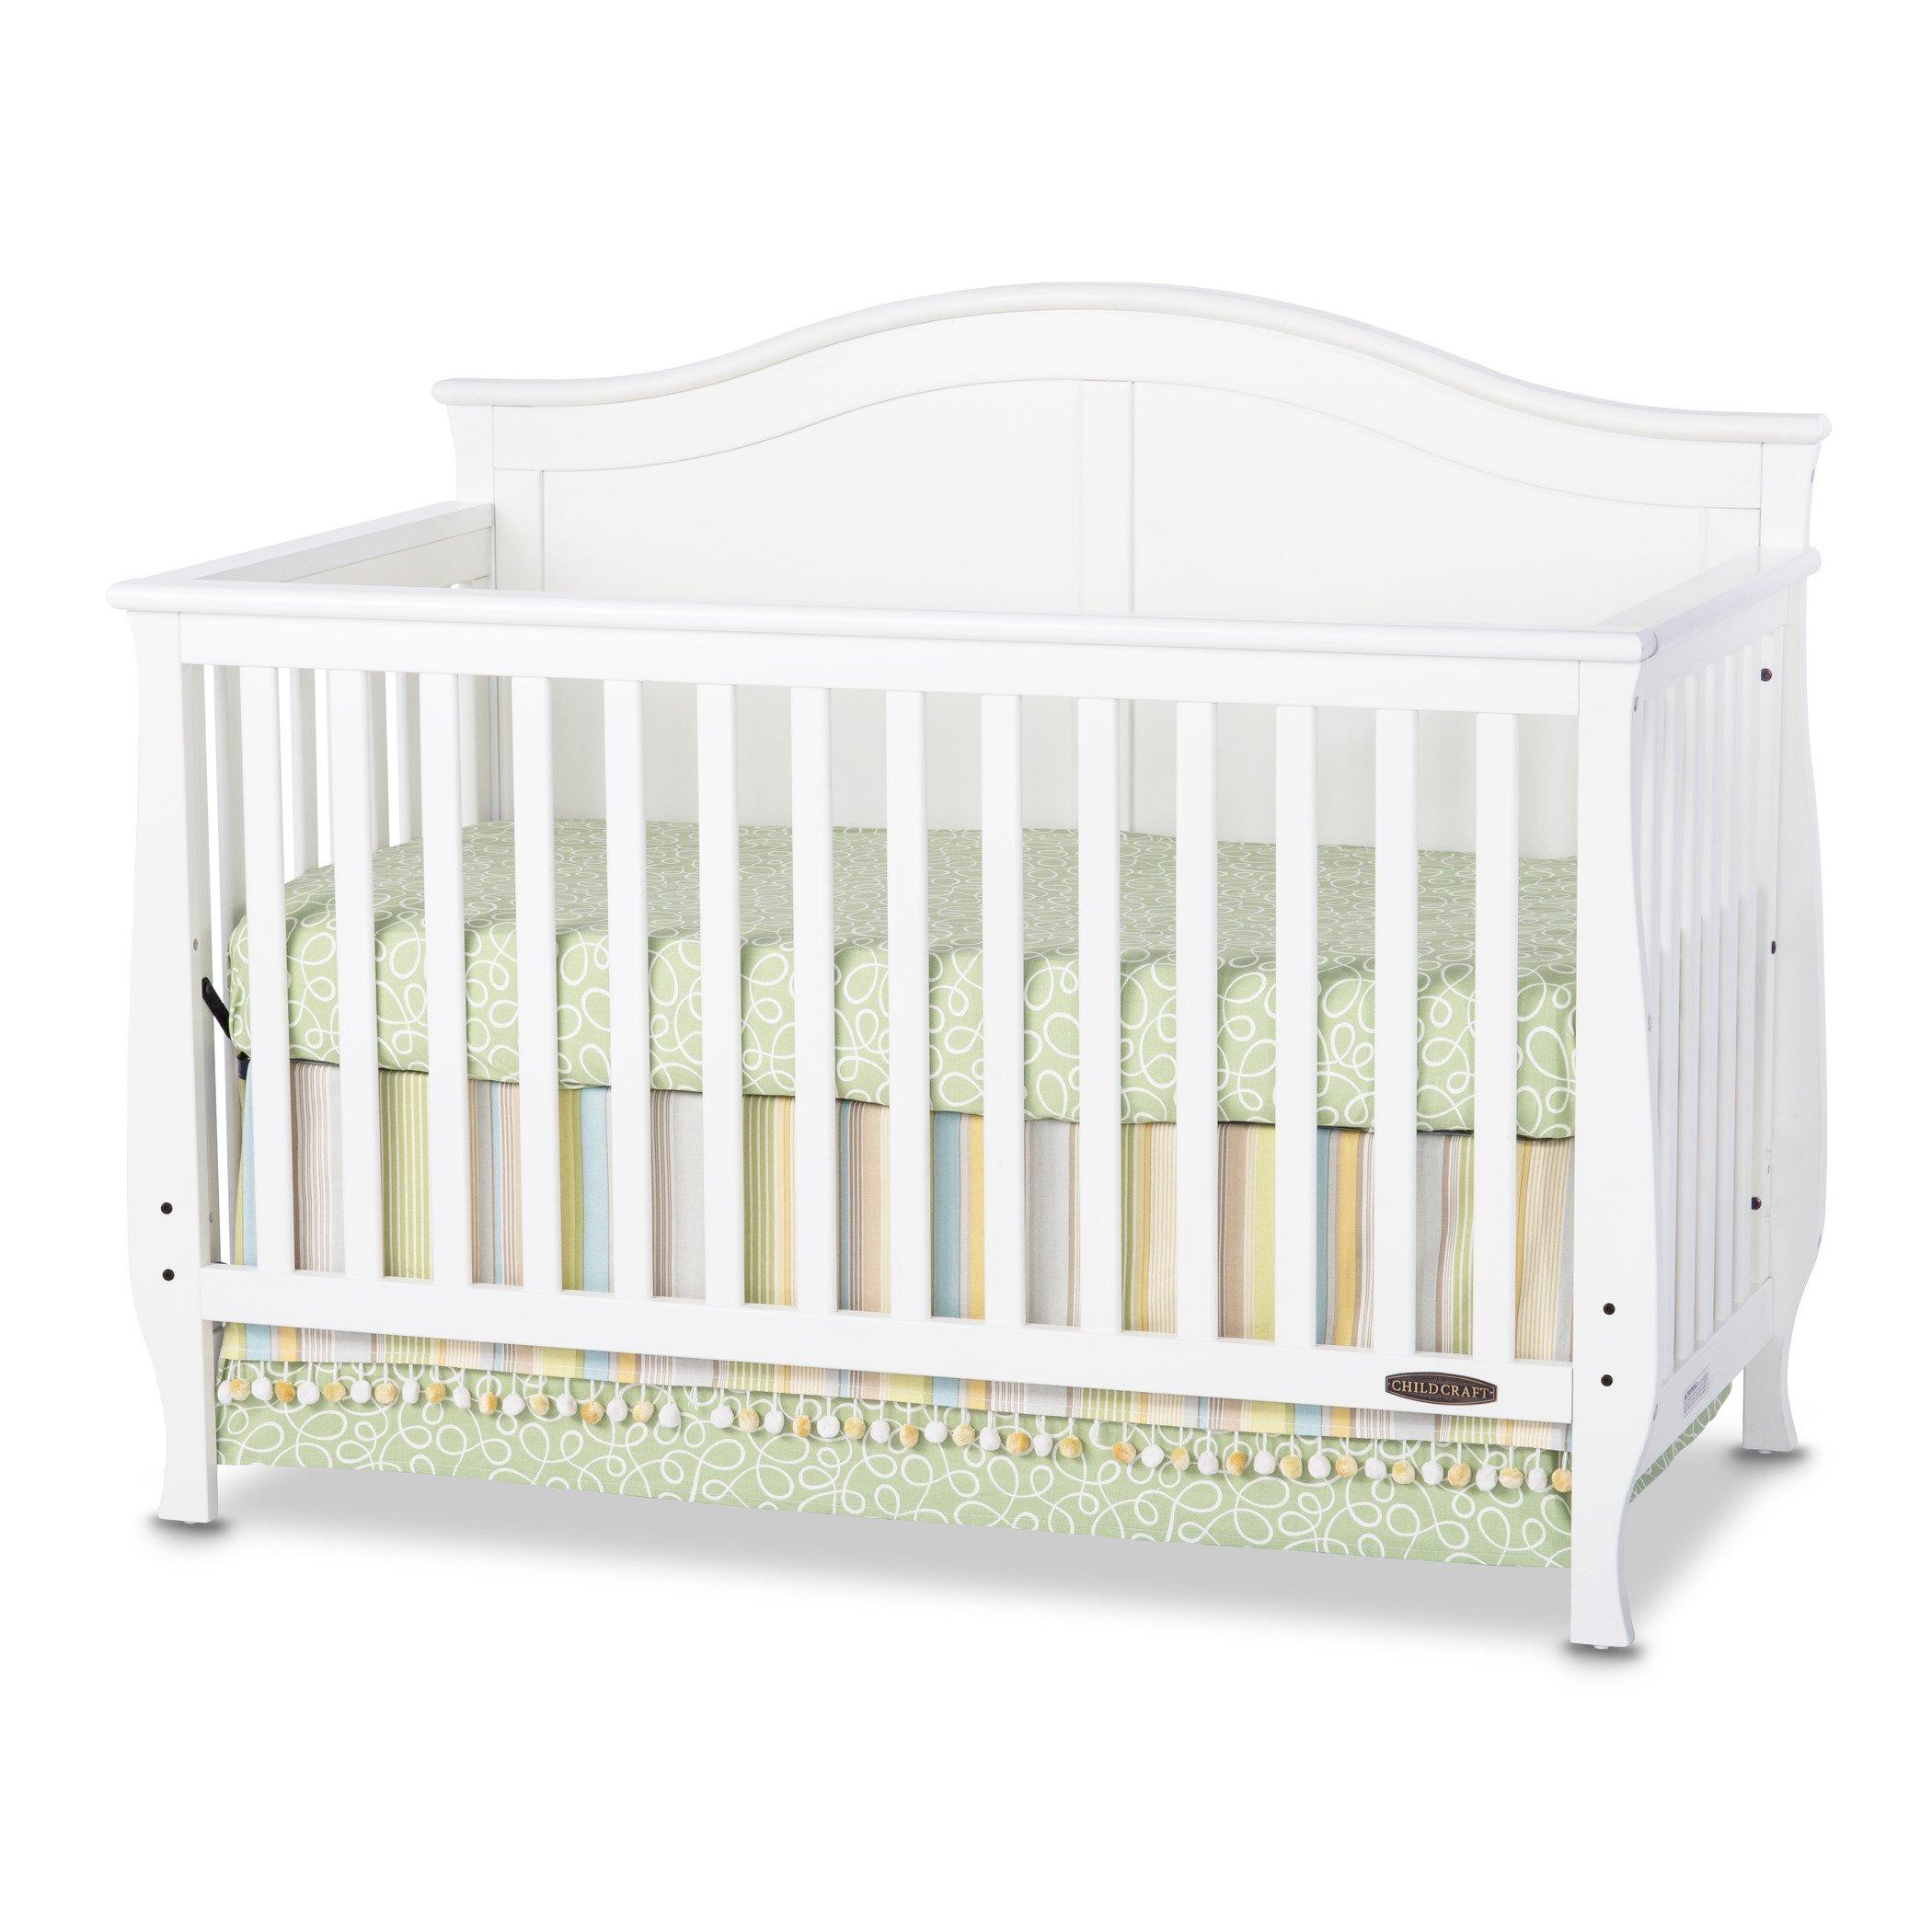 Child Craft Camden 4-in-1 Lifetime Convertible Crib, White